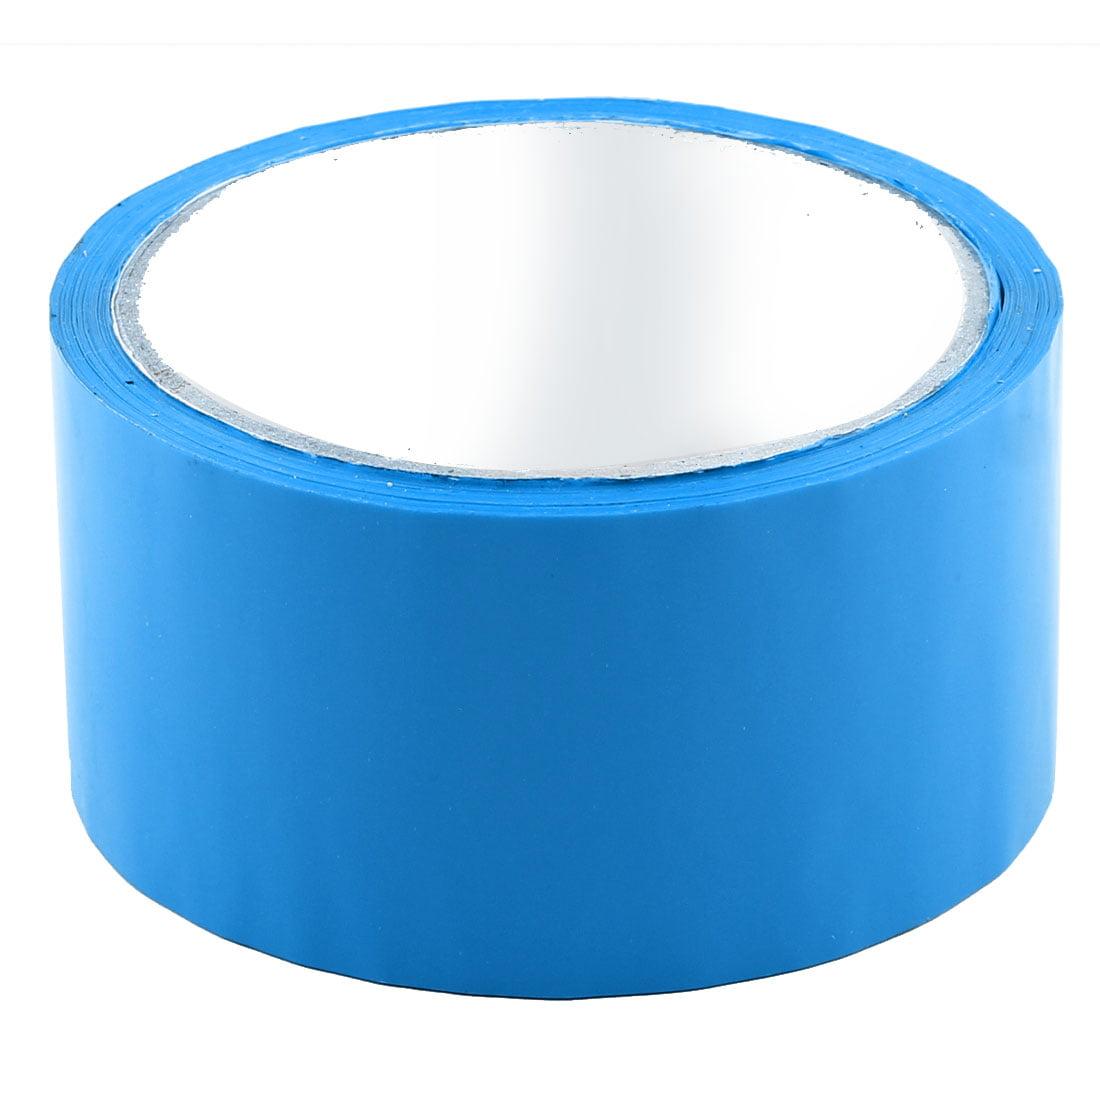 Shipping PVC Box Parcels Sealing Adhesive Tape Blue 1.9'' x 32.8 Yards(295.3 Ft)